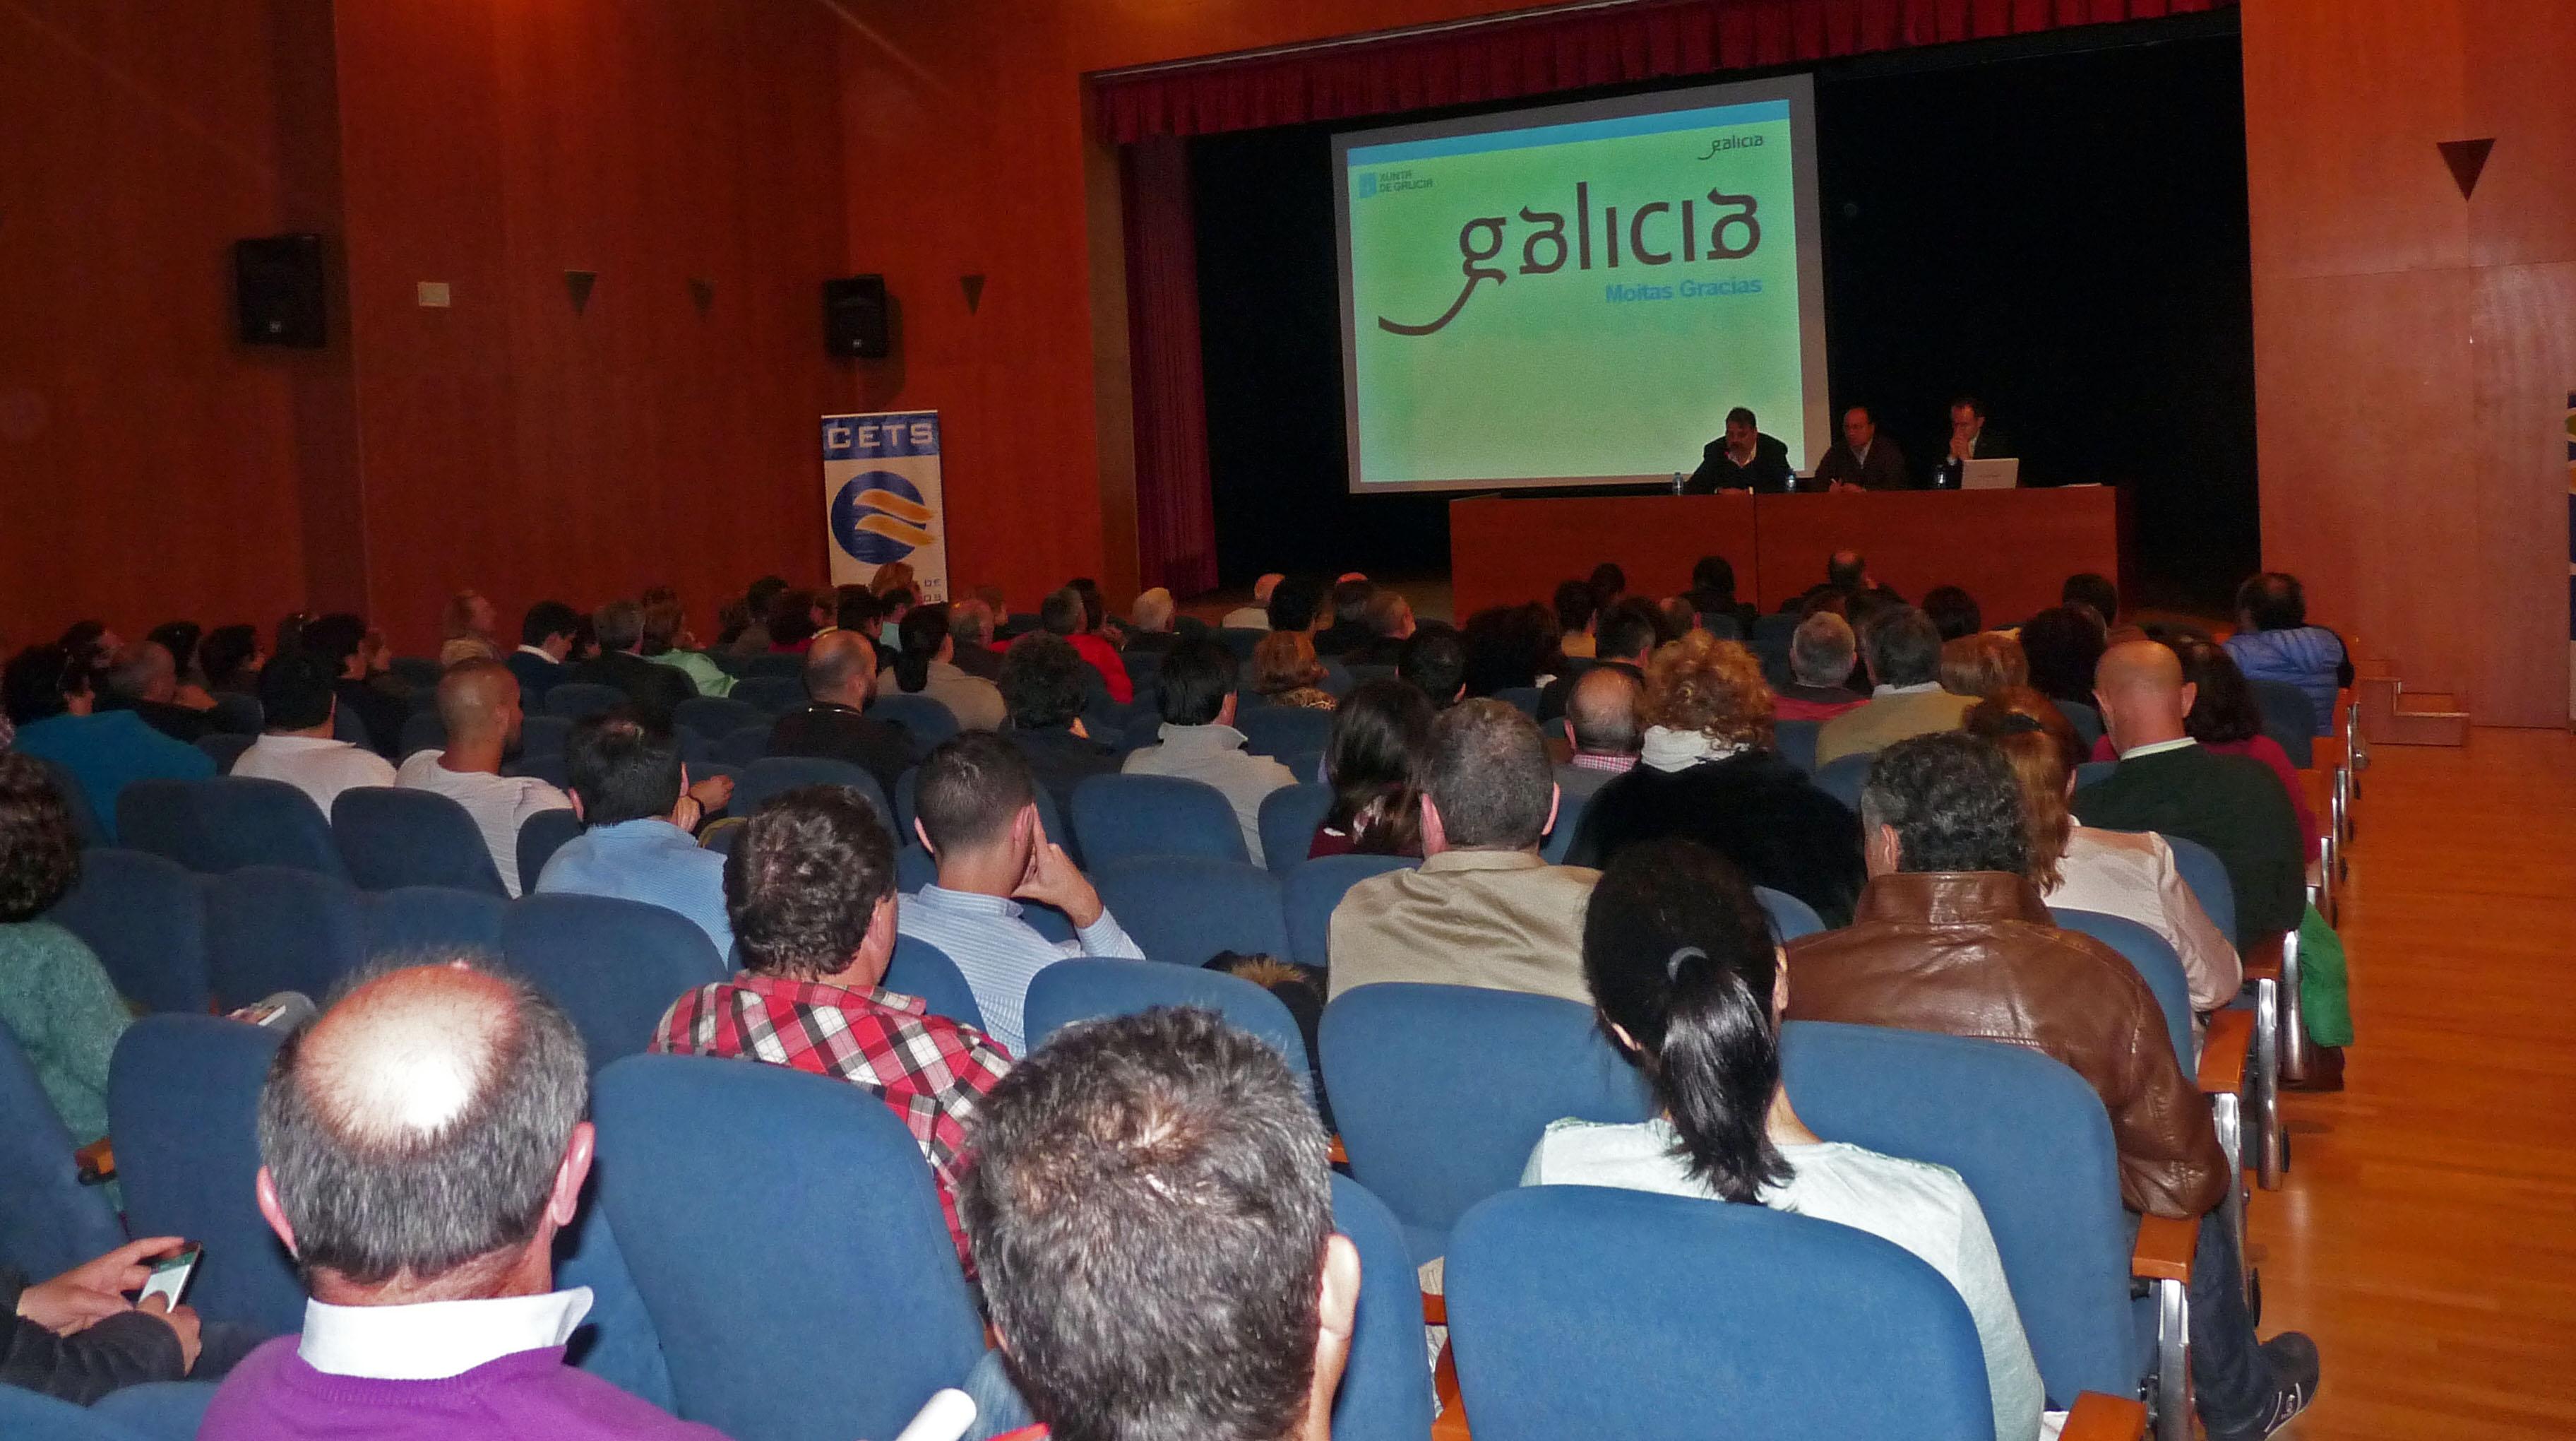 [:es]Sanxenxo acogió una charla informativa sobre las viviendas de uso turísticoSanxenxo acolleu unha charla informativa sobre as vivendas de uso turísticoSanxenxo hosted a briefing on tourist use housing